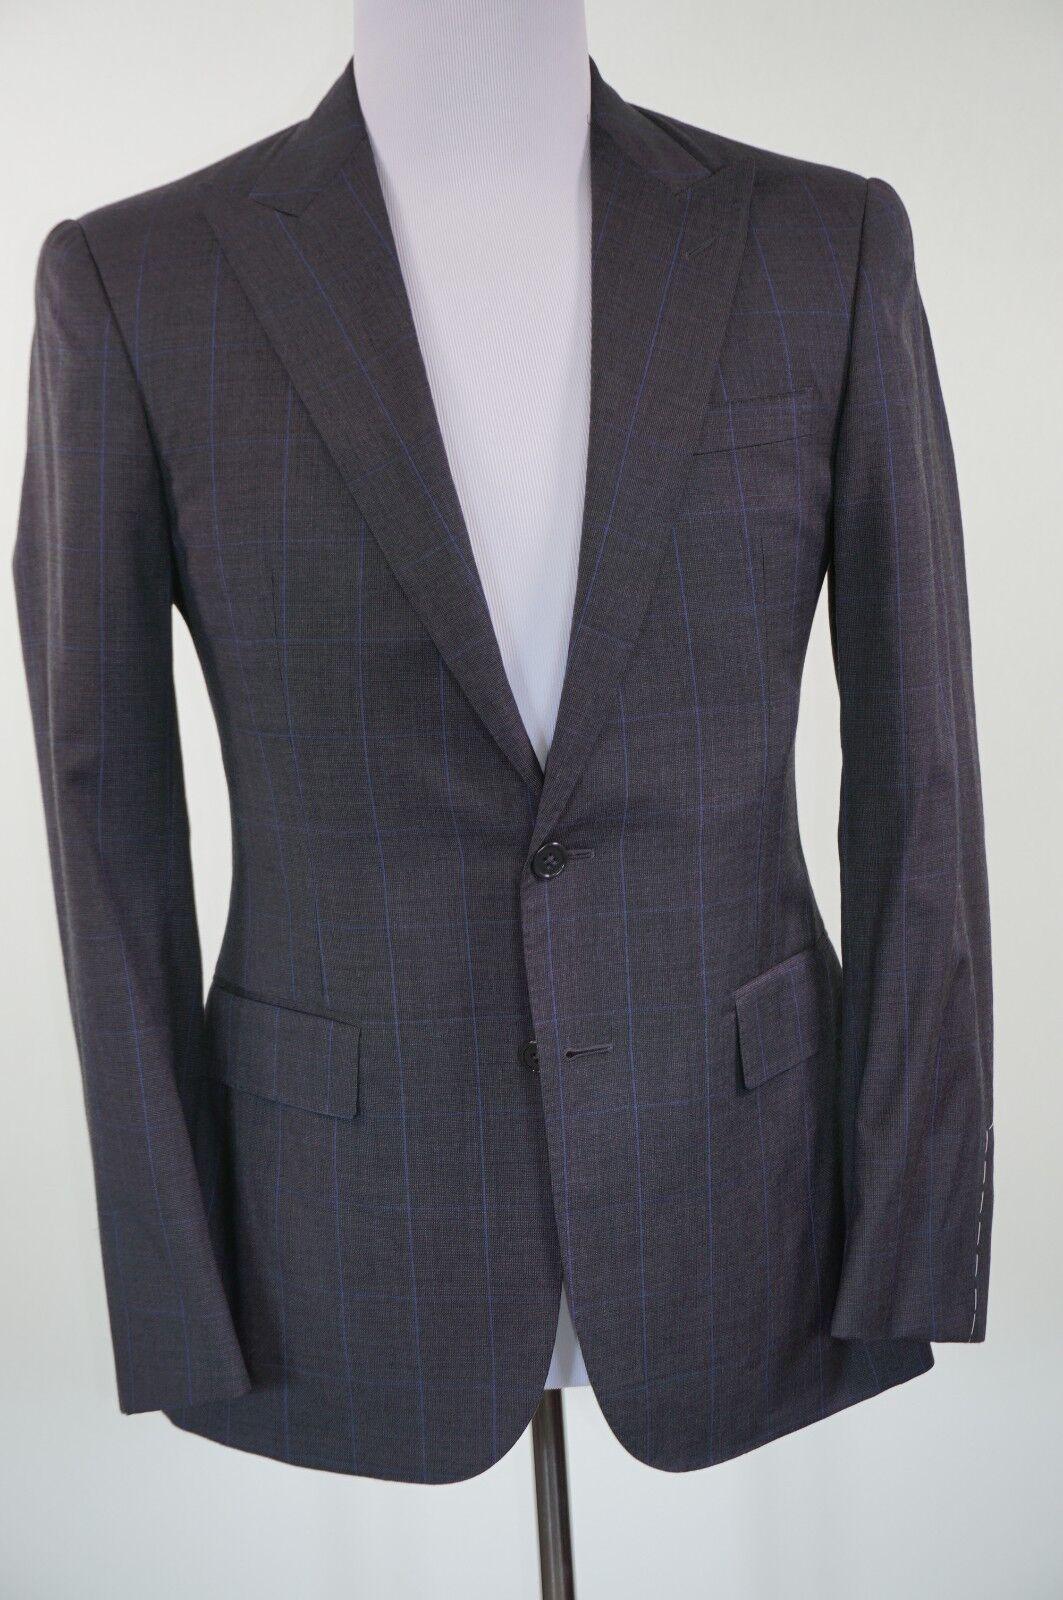 Ralph Lauren lila Label Suit 38R (31W) Anthony grau 100% Wool MSRP 2385